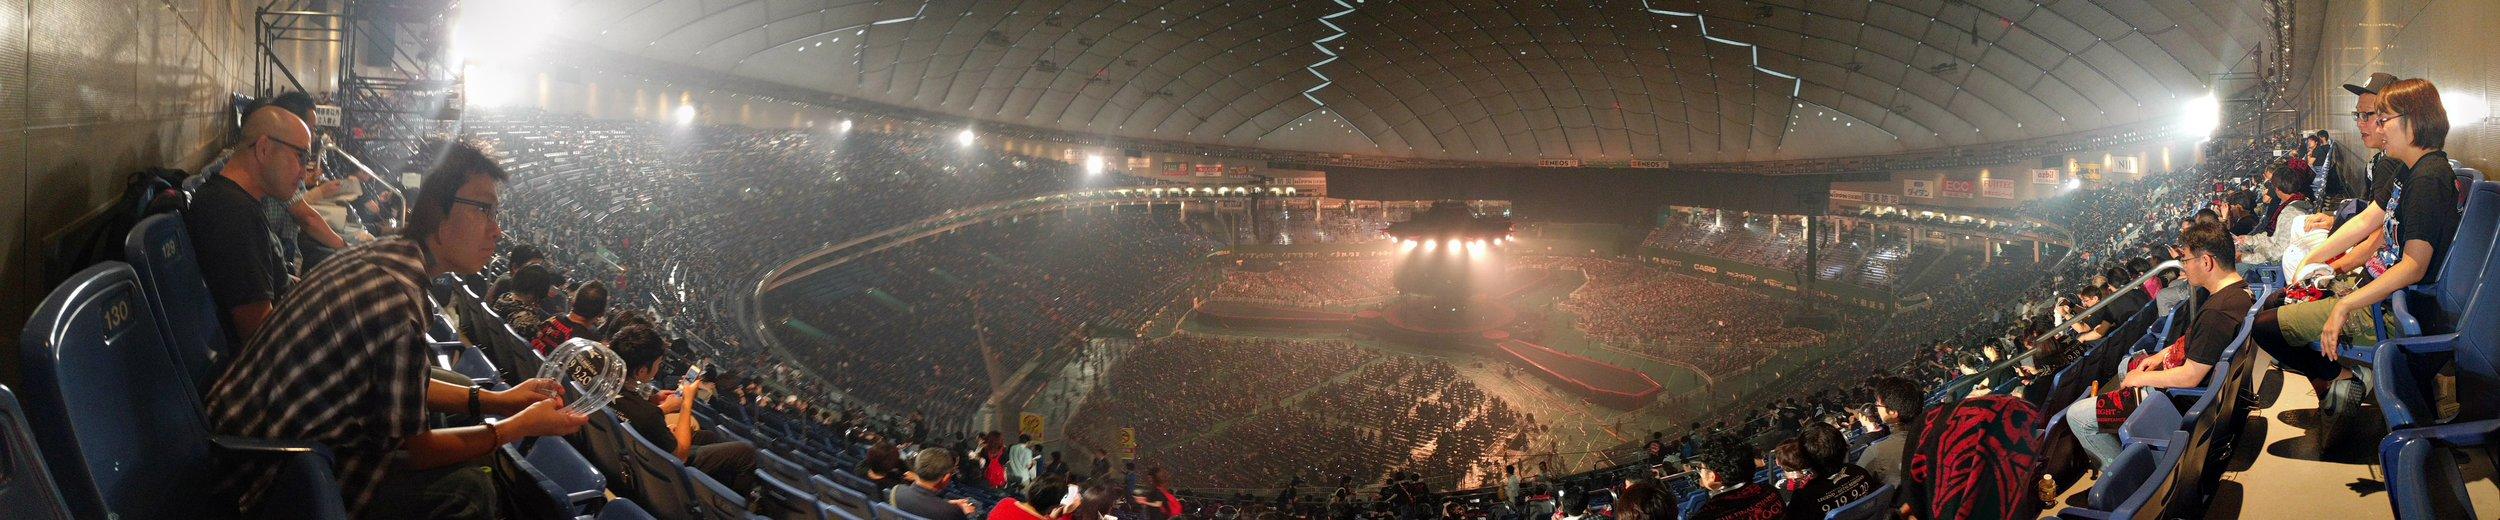 Inside Tokyo Dome